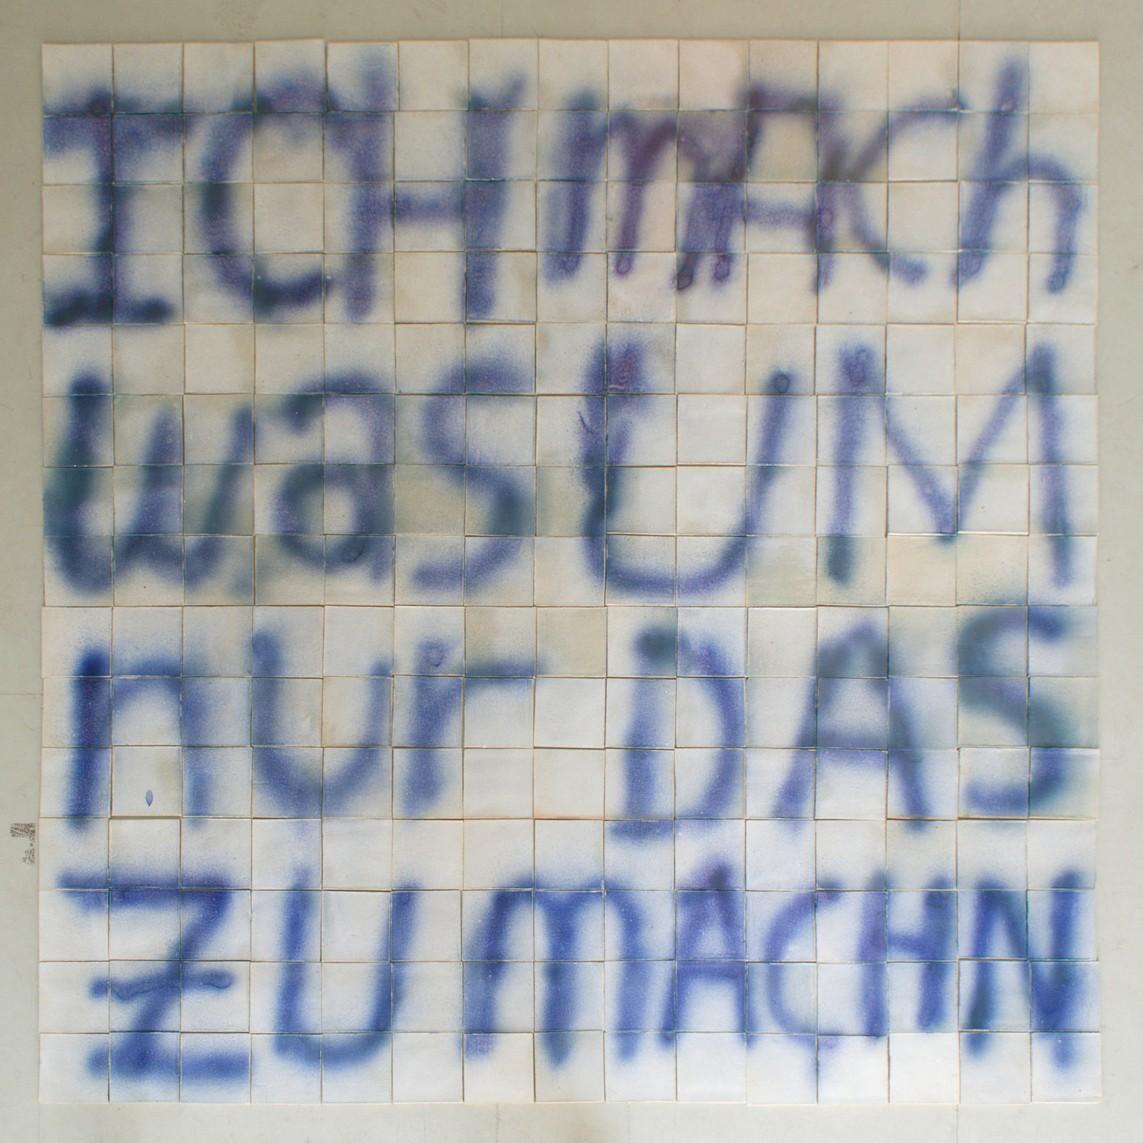 DOMINIK – JUST DO IT. / 225 Keramik-Kacheln, handgemacht, je 14 x 14 cm, 2016